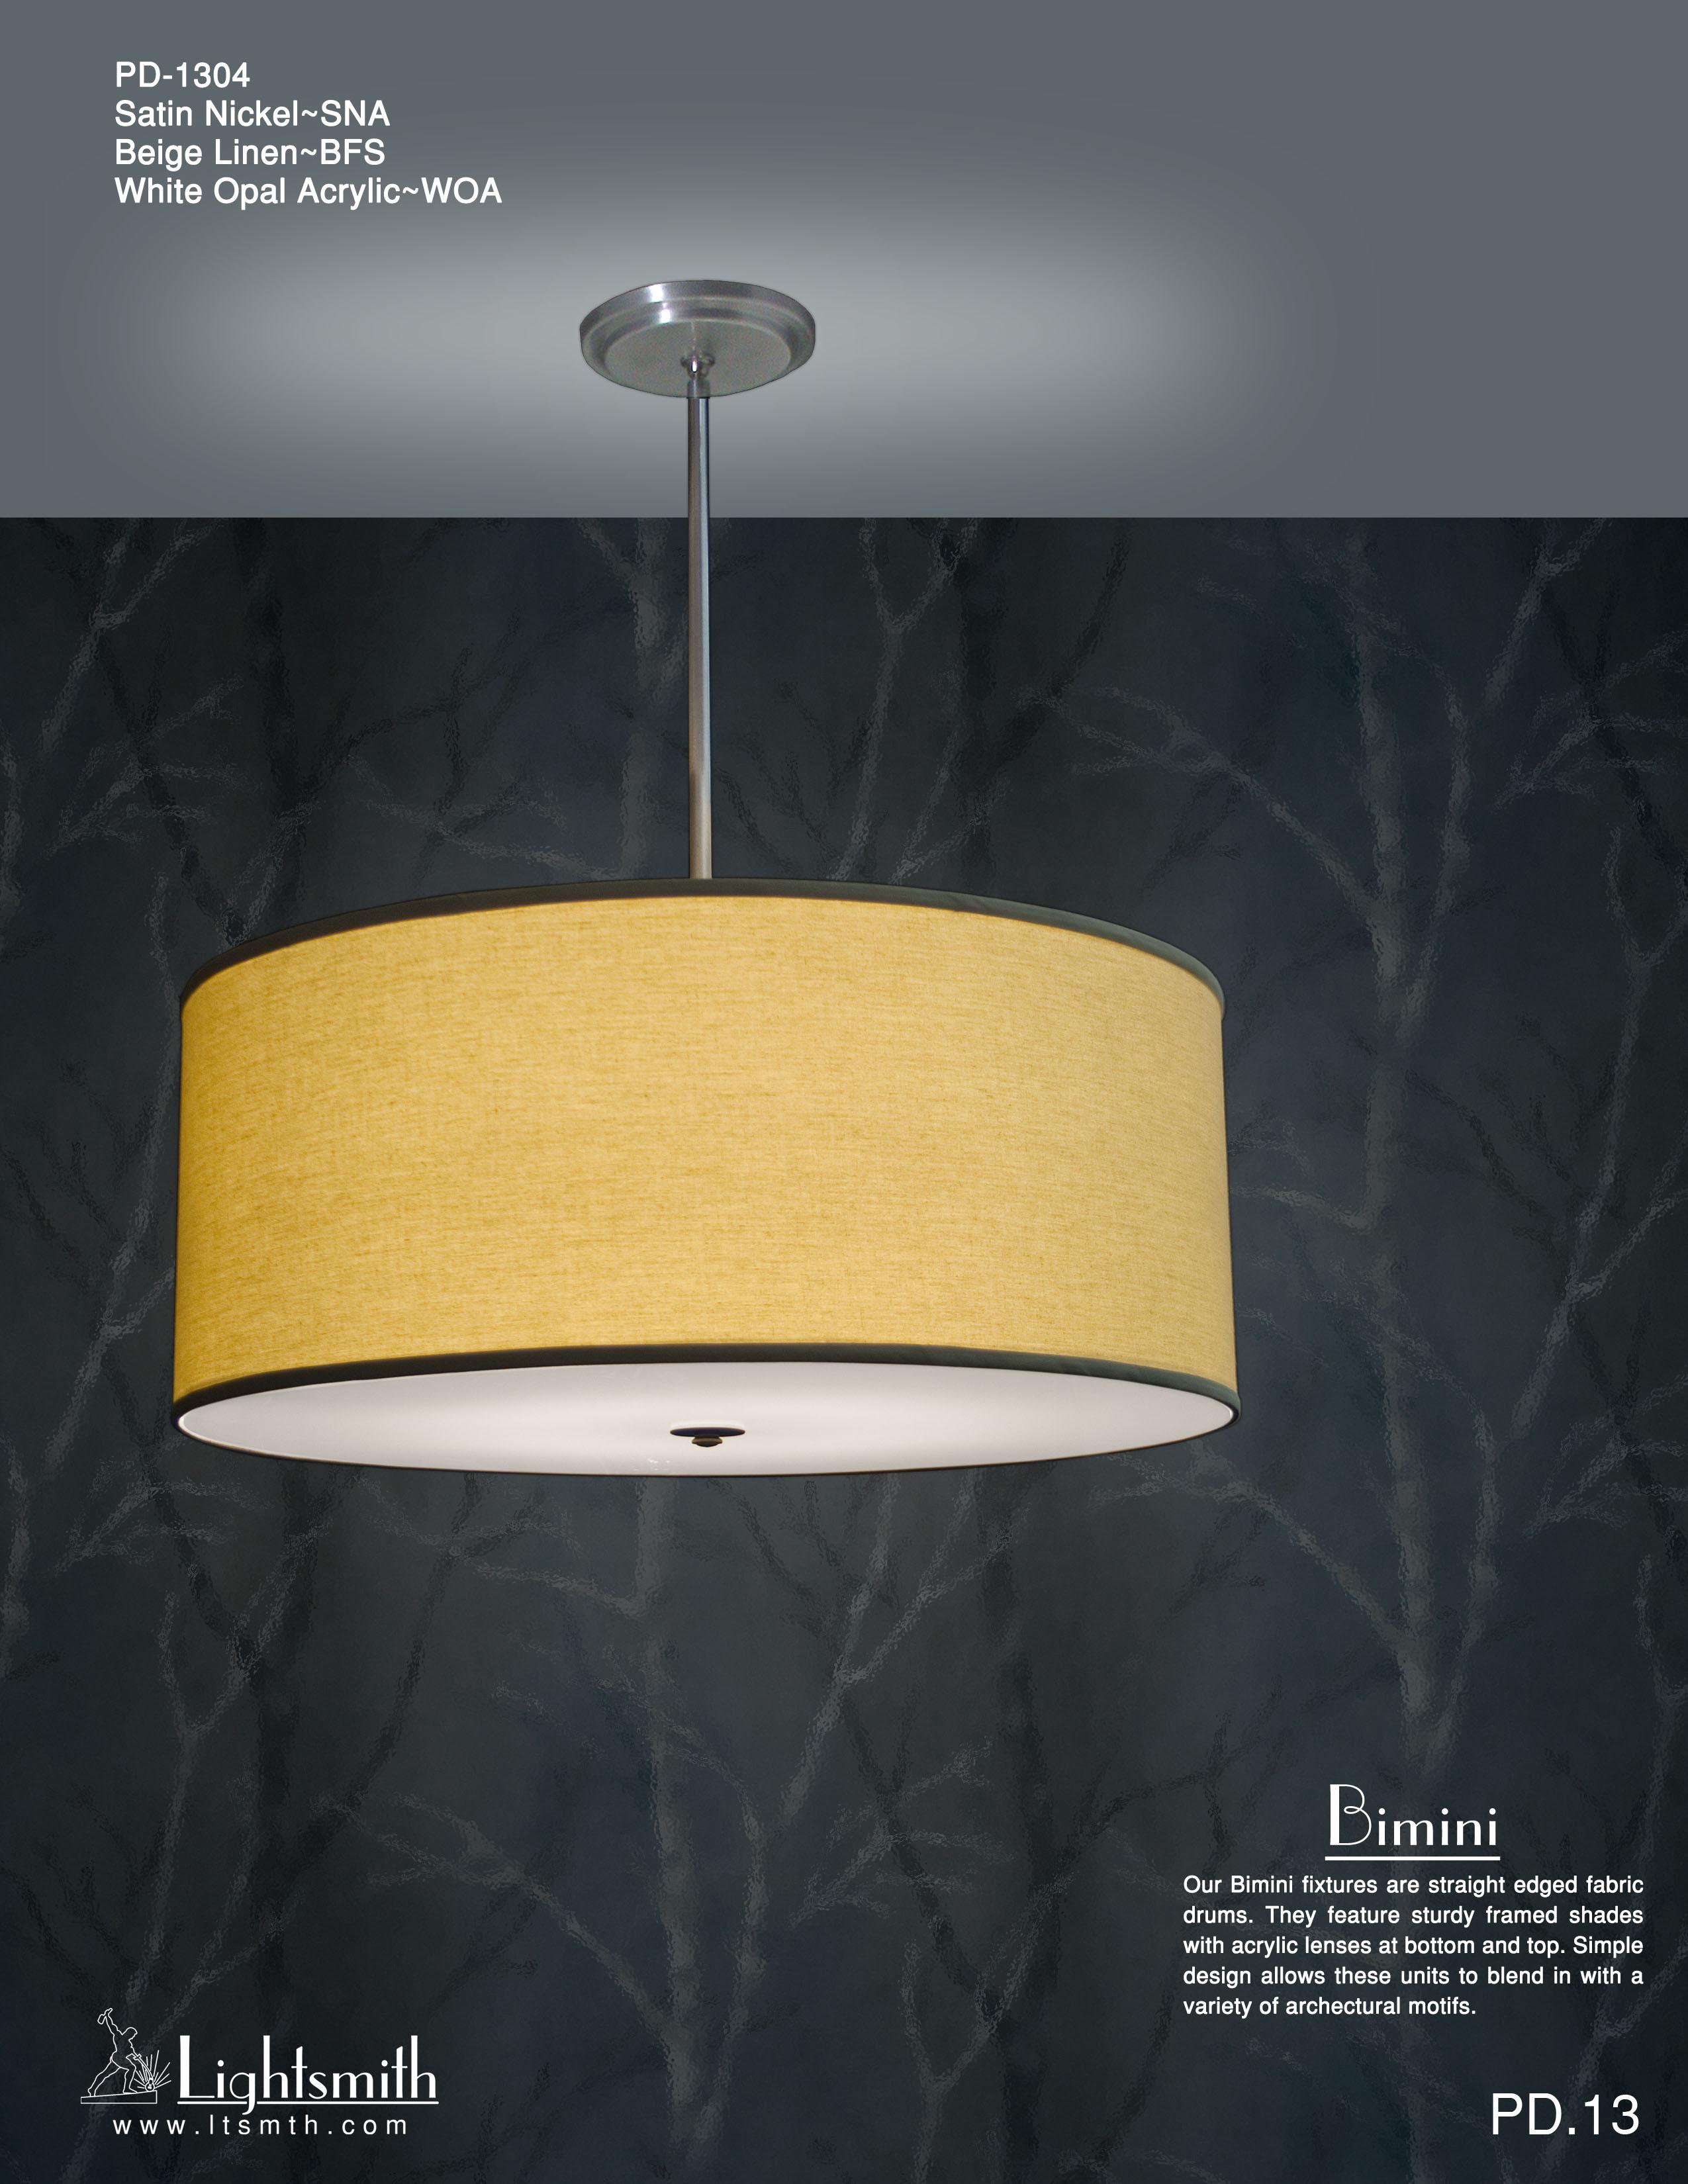 Bimini Lightsmith Pd Simple 1304 Satin Nickel Beige Linen White Opal Acrylic